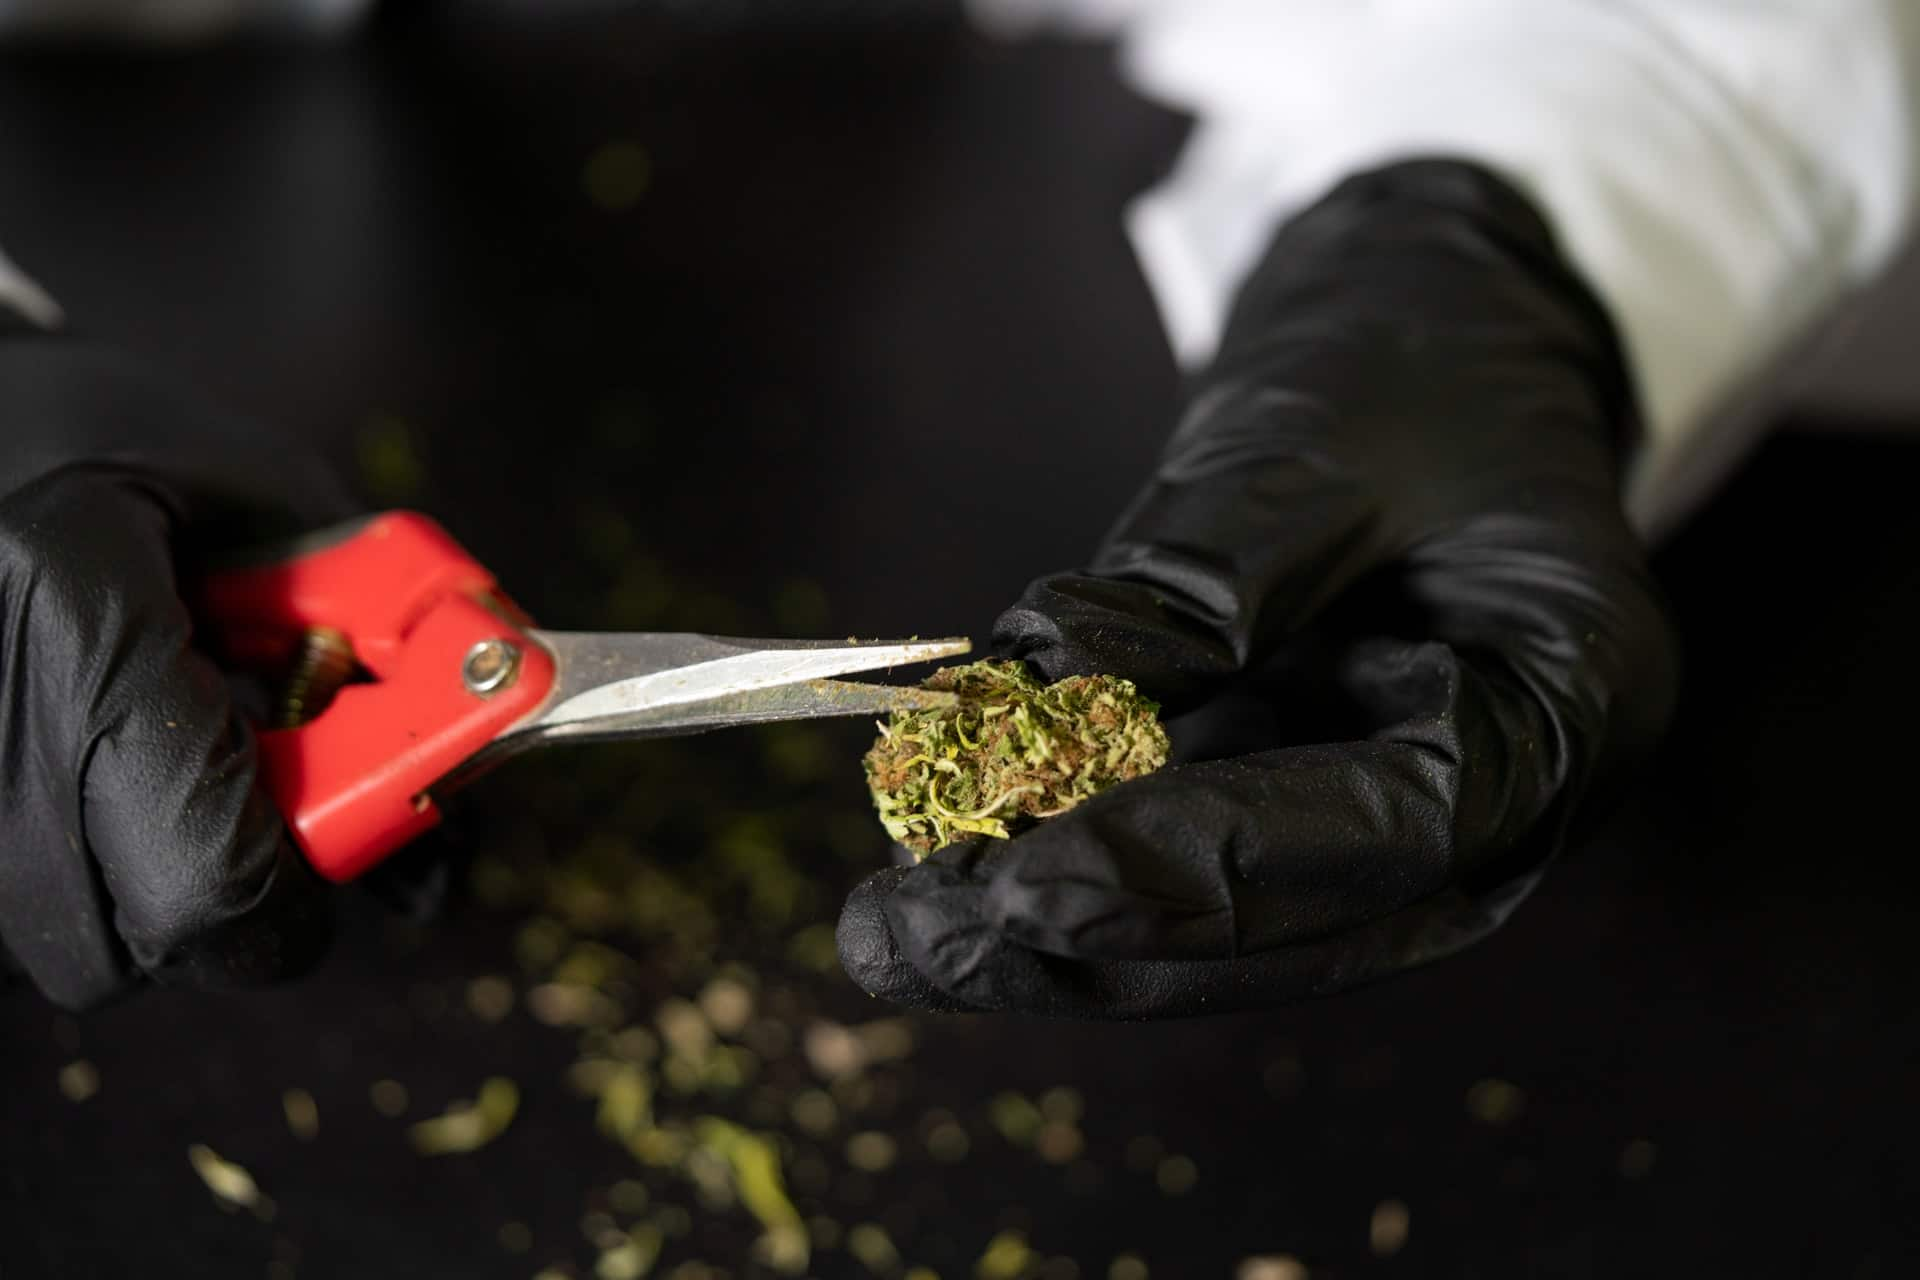 Nación Cannabis | Cómo almacenar tu marihuana